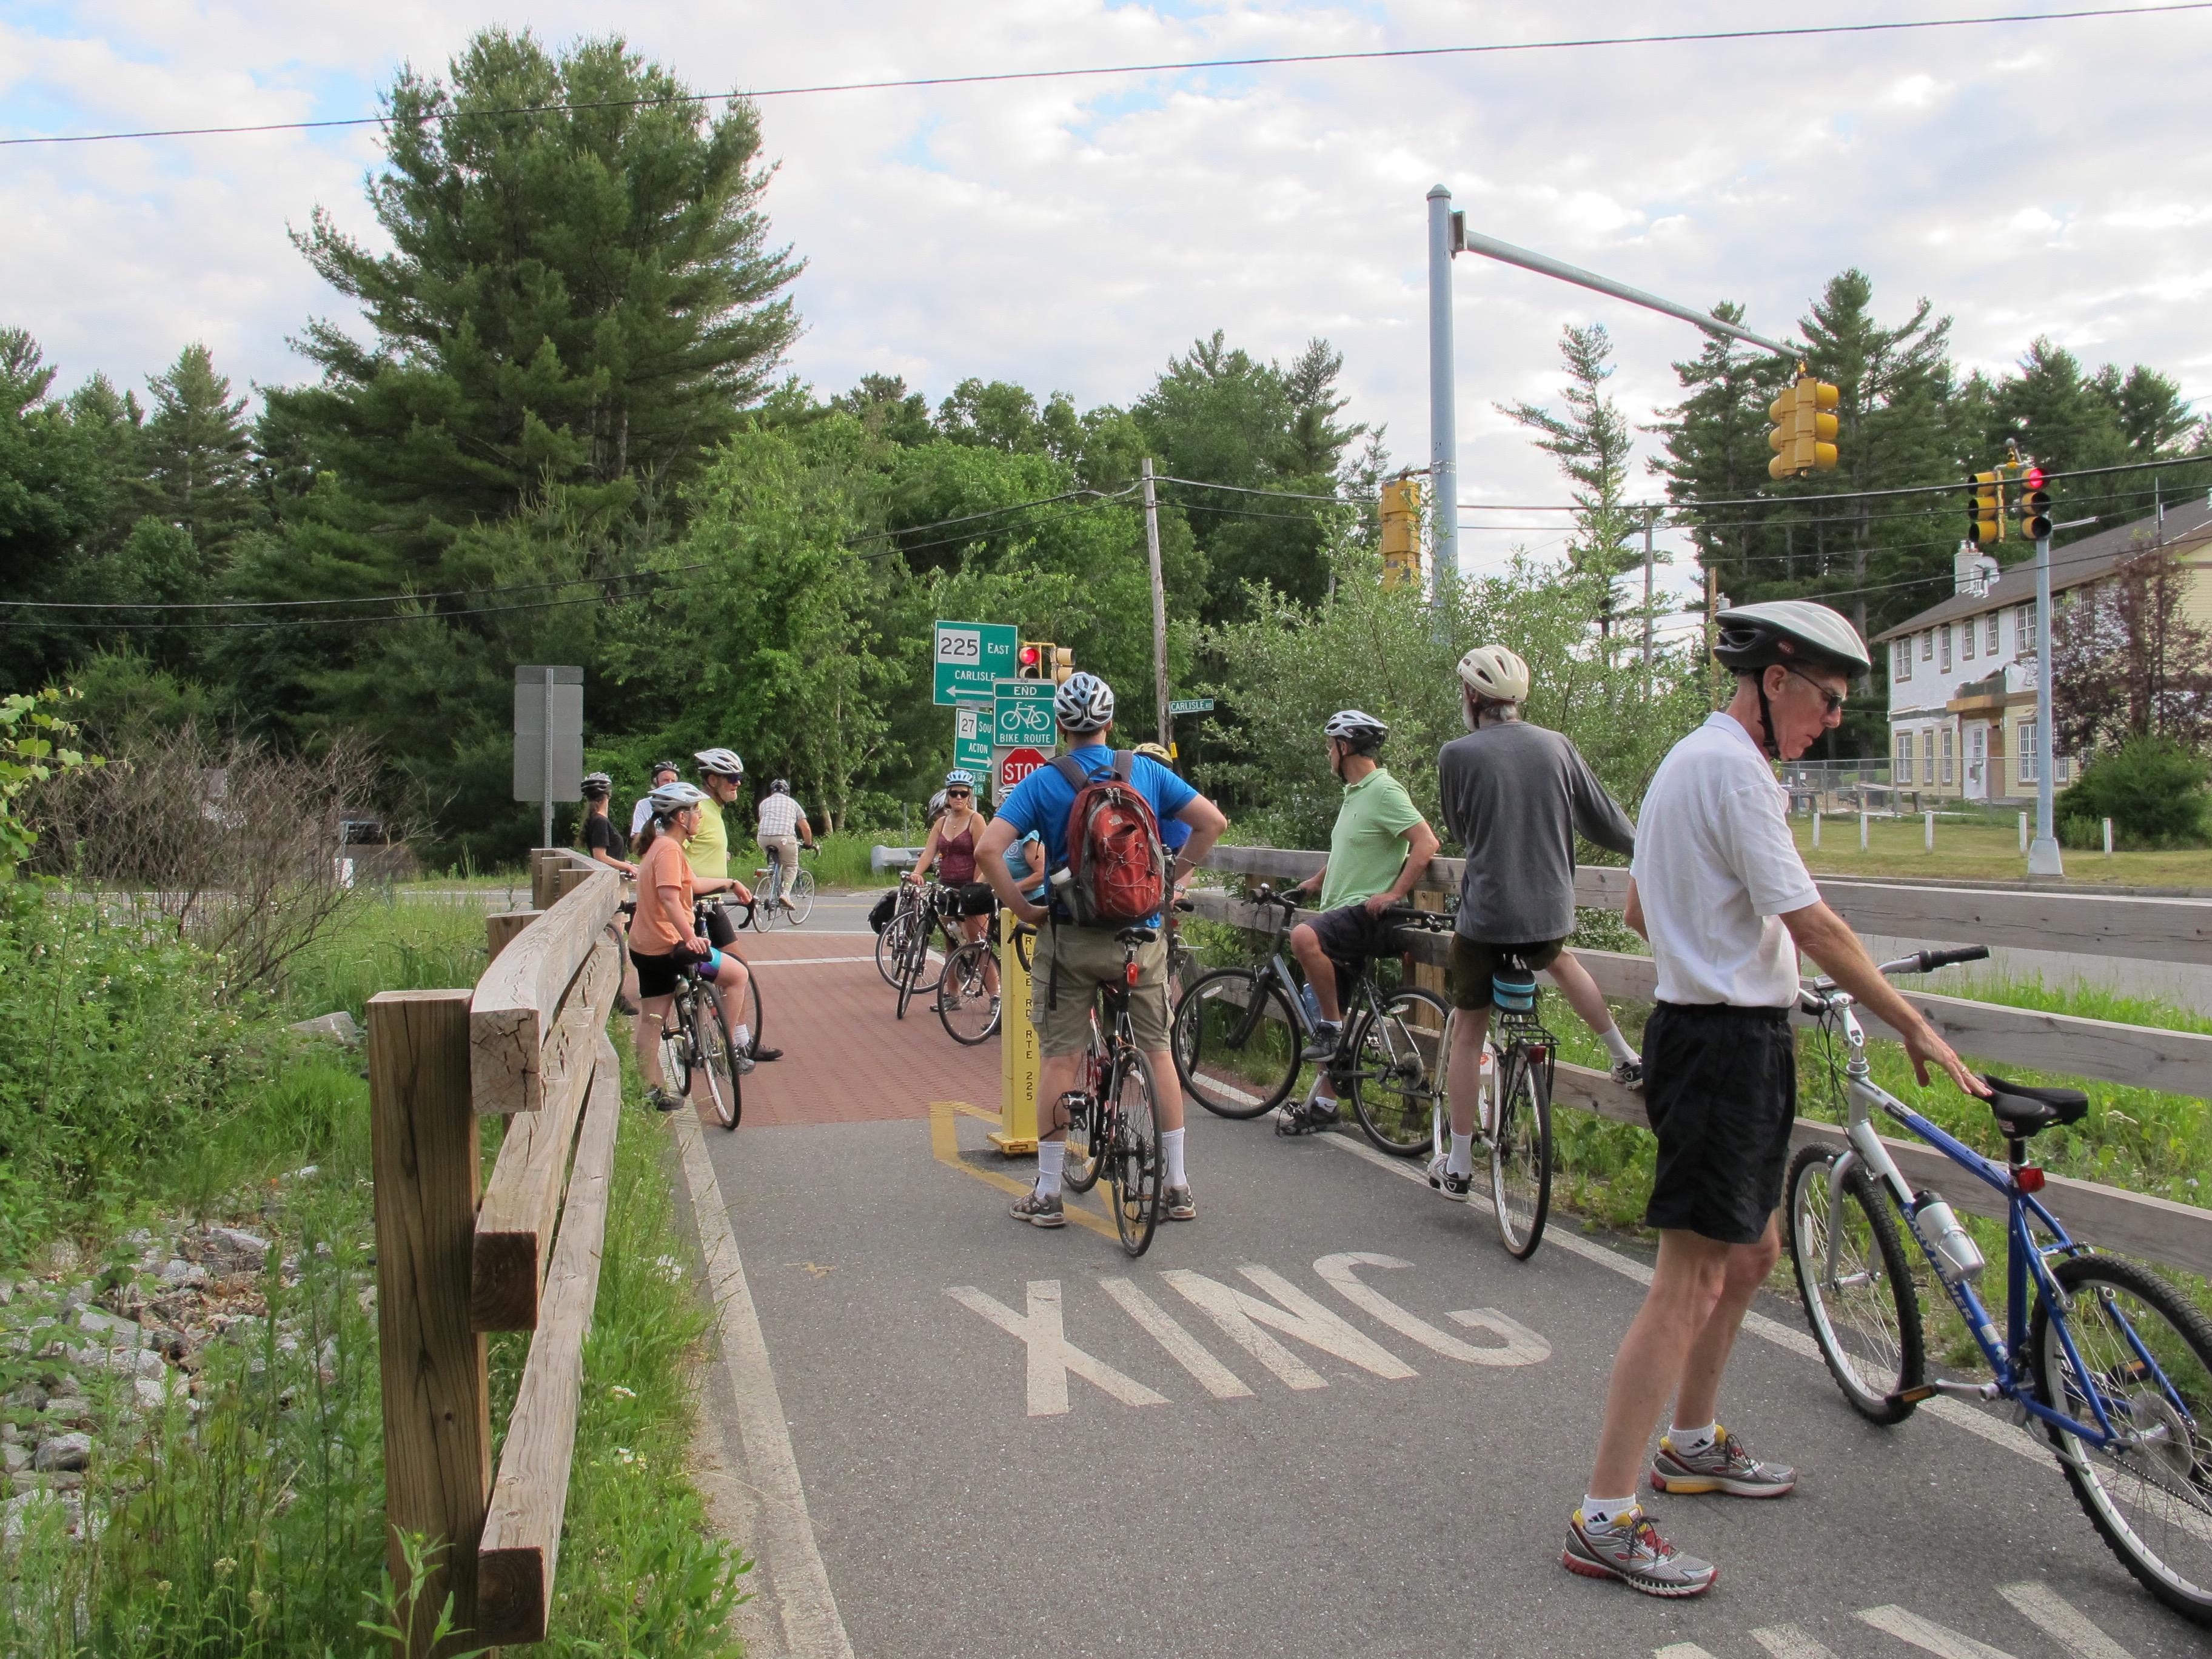 Summer Solstice Ride on the Bruce Freeman Rail Trail - June 21, 2014